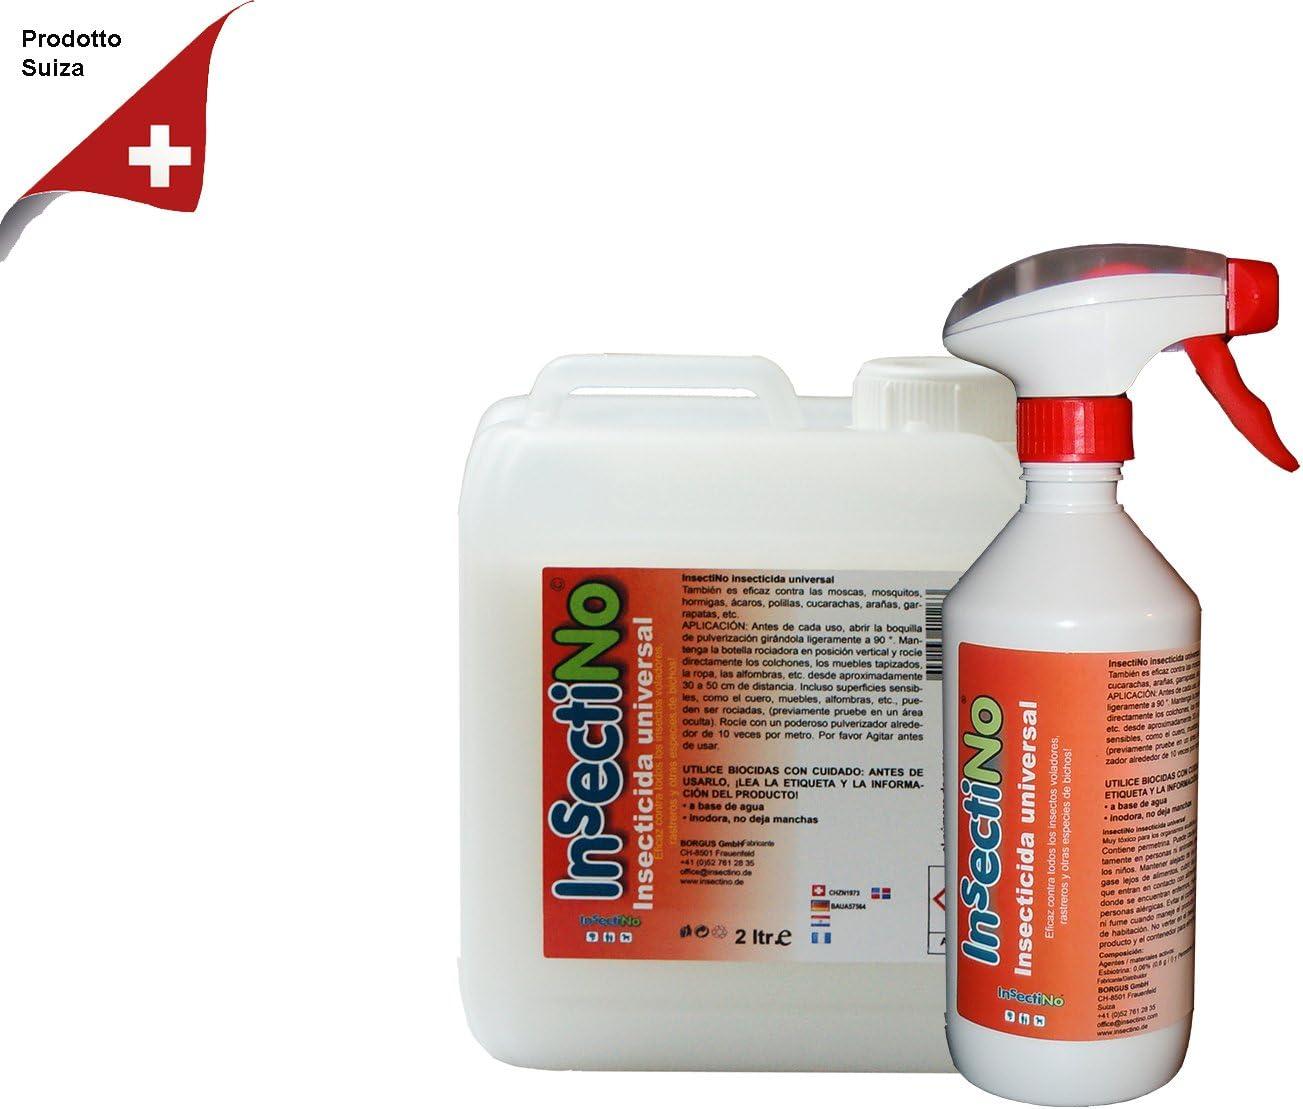 INSECTINO Insecticida Universal - 1 x bidón 2 LTR/1 x 500 ml - contra Las Moscas, Mosquitos, Hormigas, ácaros, polillas, cucarachas, arañas, garrapatas